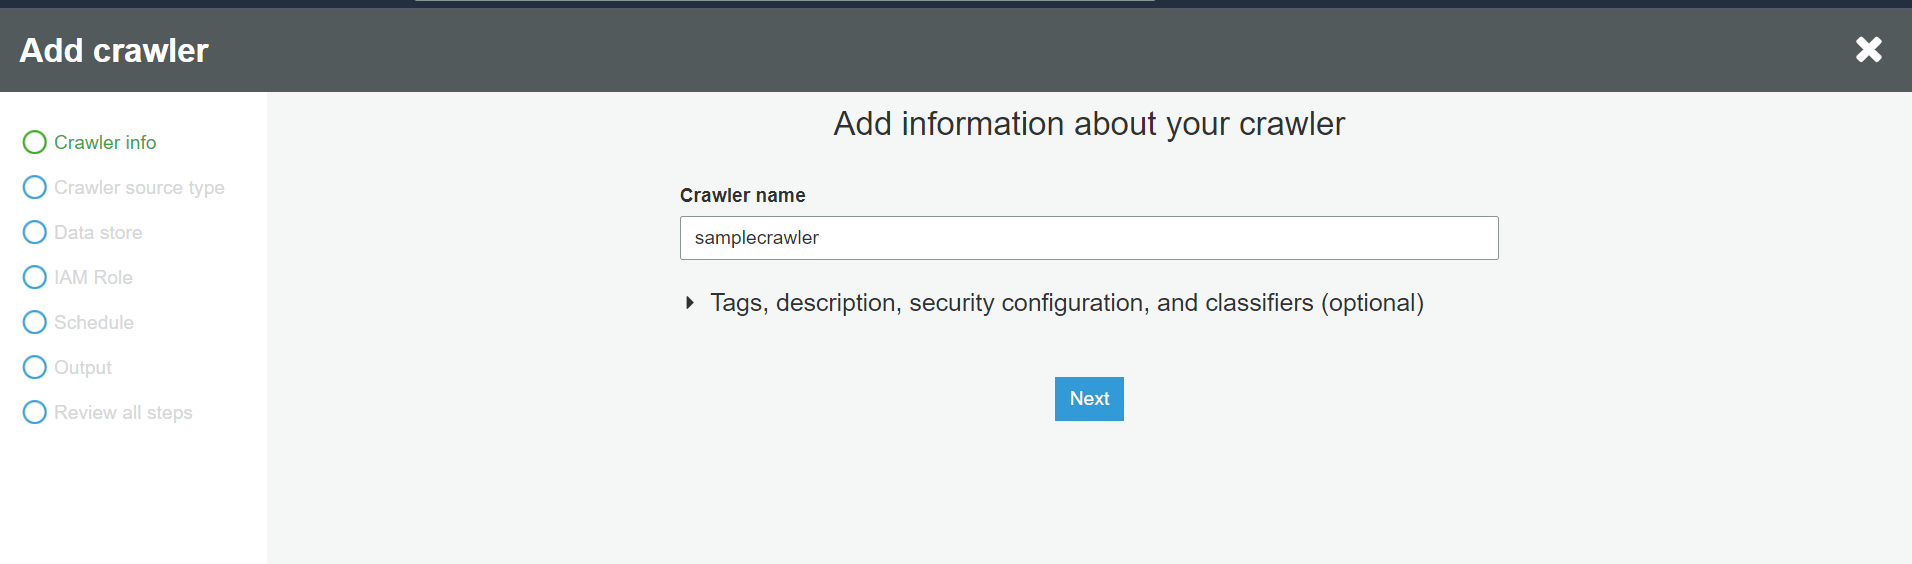 Crawler name:samplecrawler.